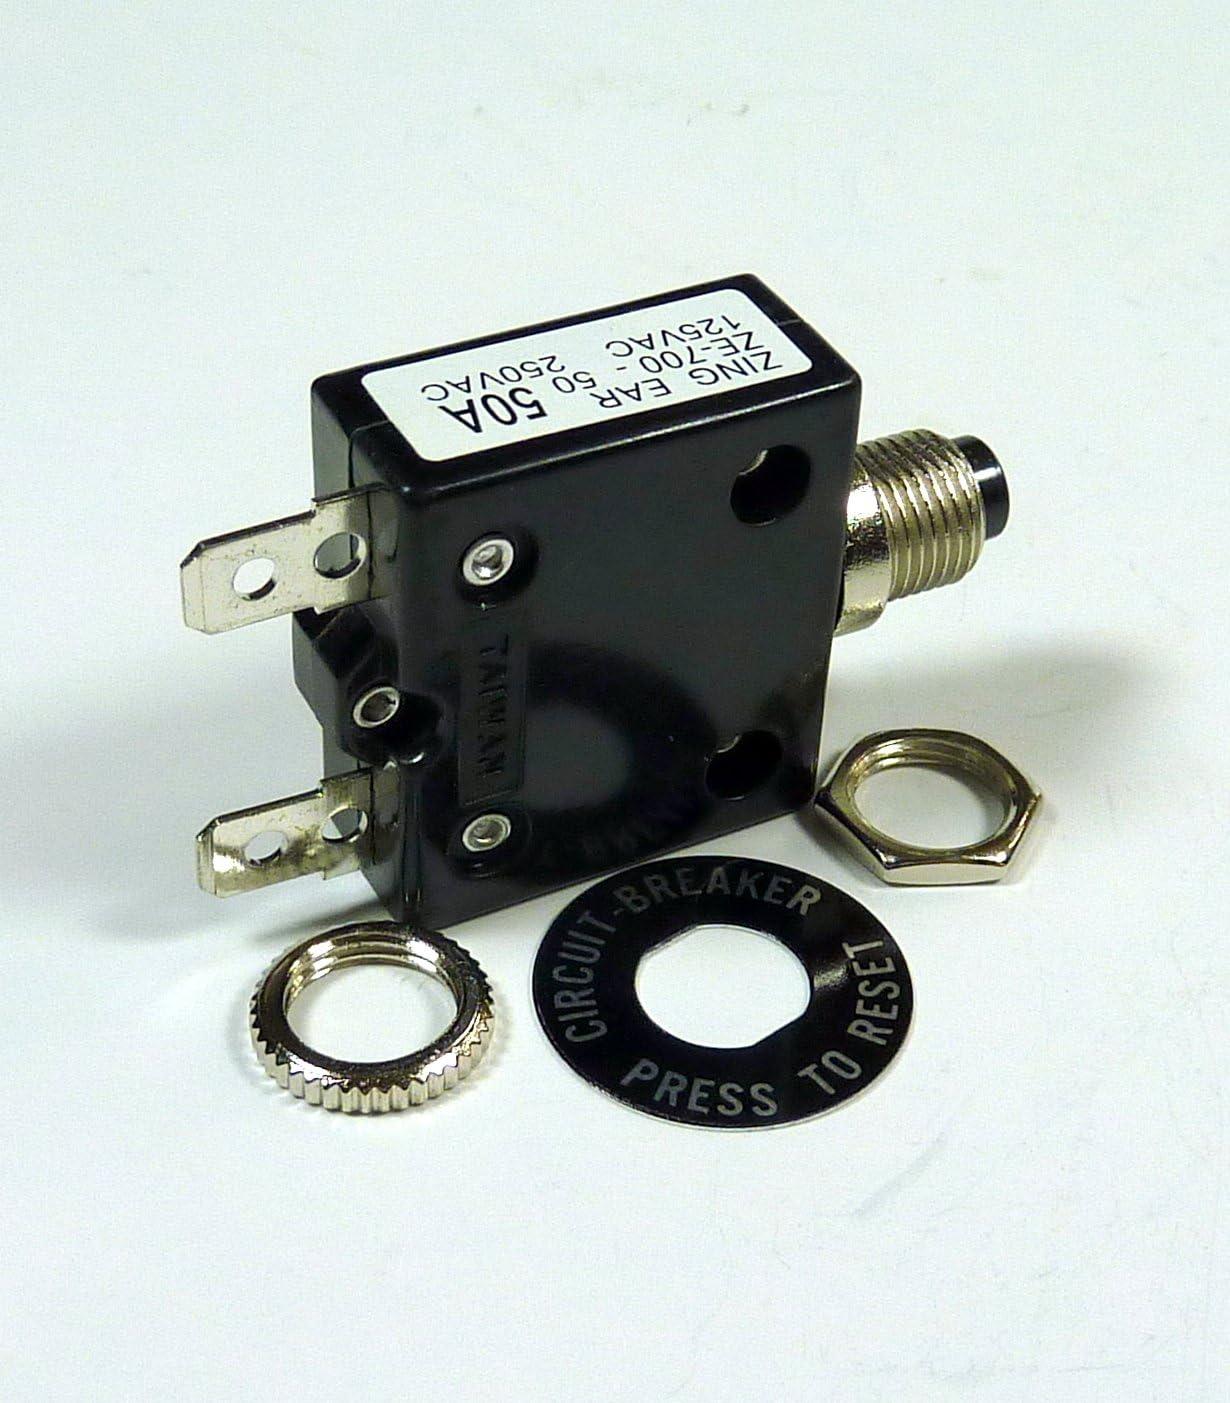 125V AC Philmore B7050 50A Push Manual Reset Thermal Circuit Breaker 50V DC